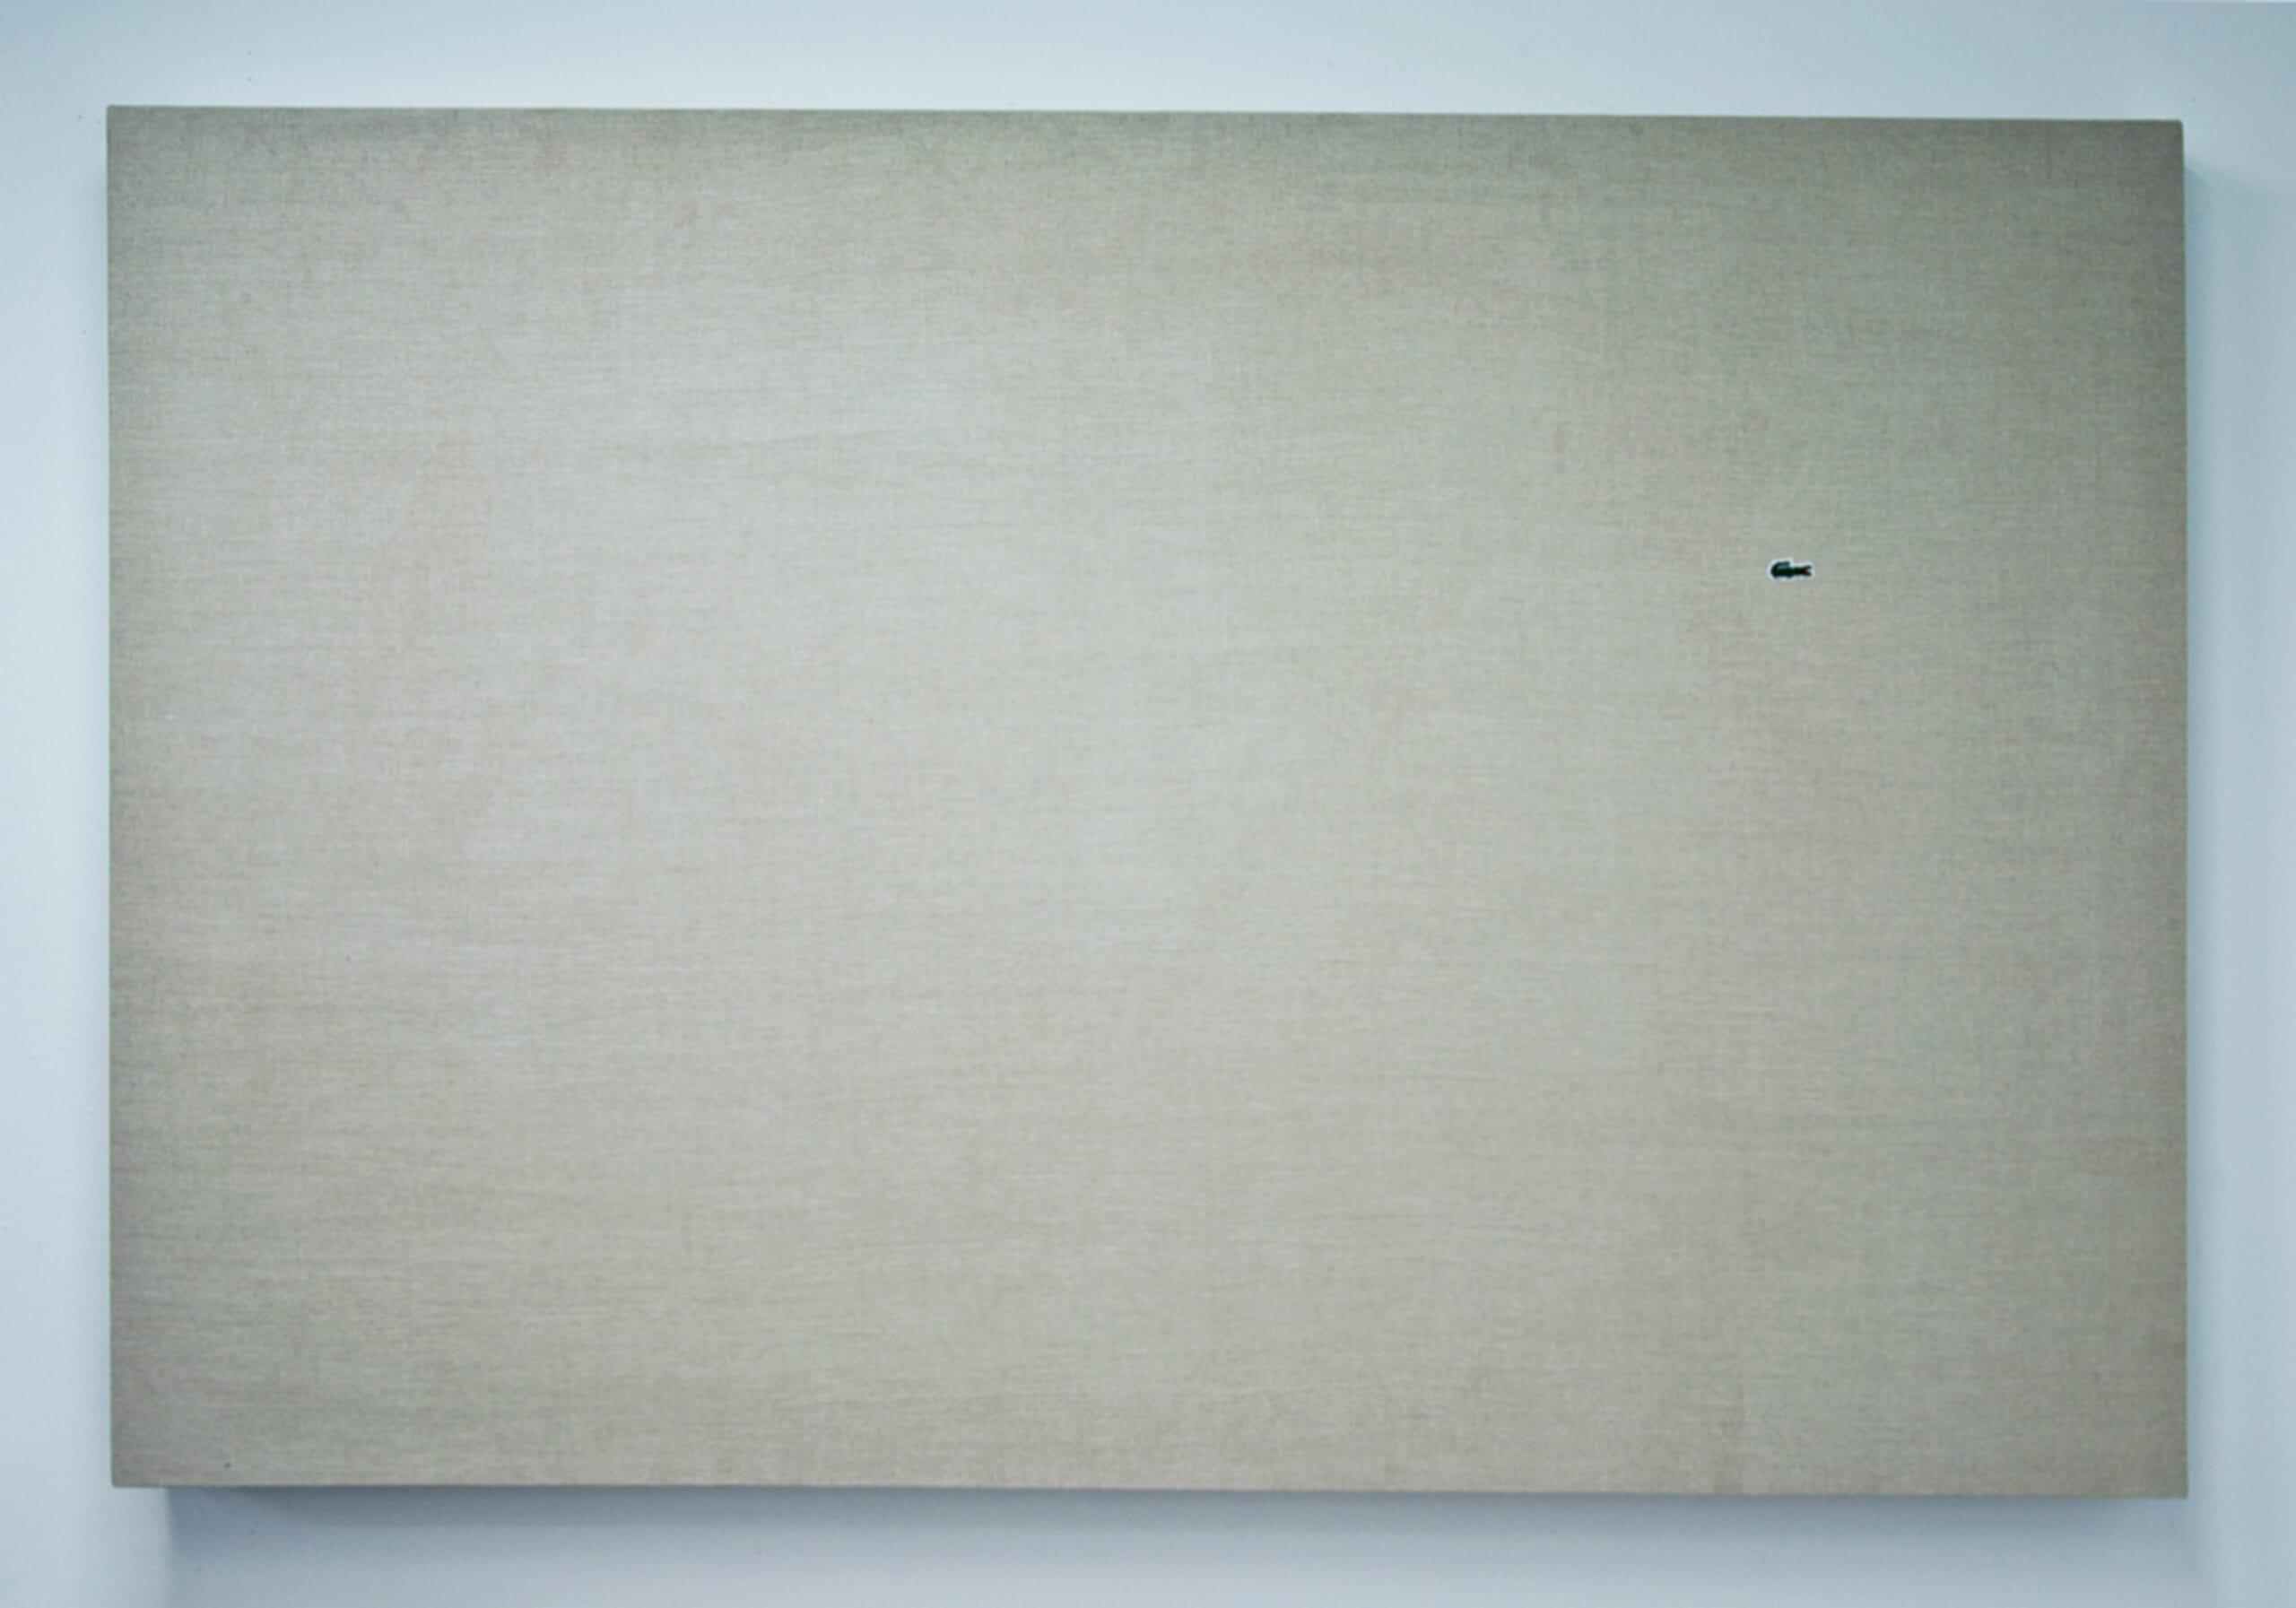 Jason Guo, My Canvas Is Better Than Your Canvas, Belgian linen, poplar, thread, 183 x 122 x 6 cm, 2012